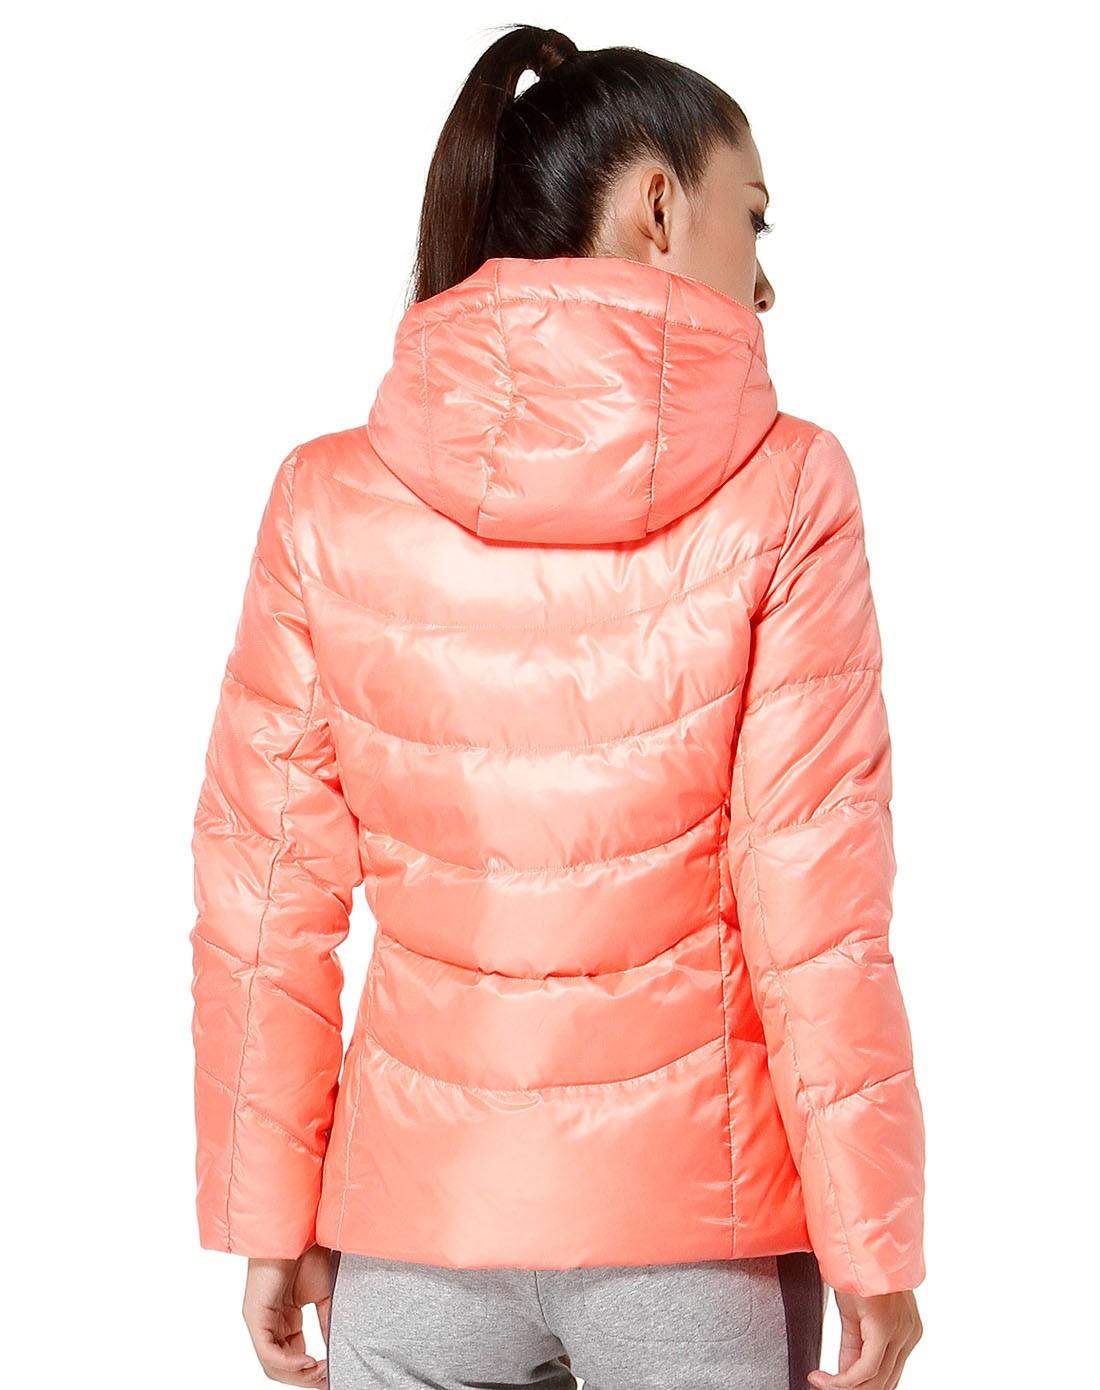 Manteau de sport femme LINING AYMH026-1 - Ref 505531 Image 7